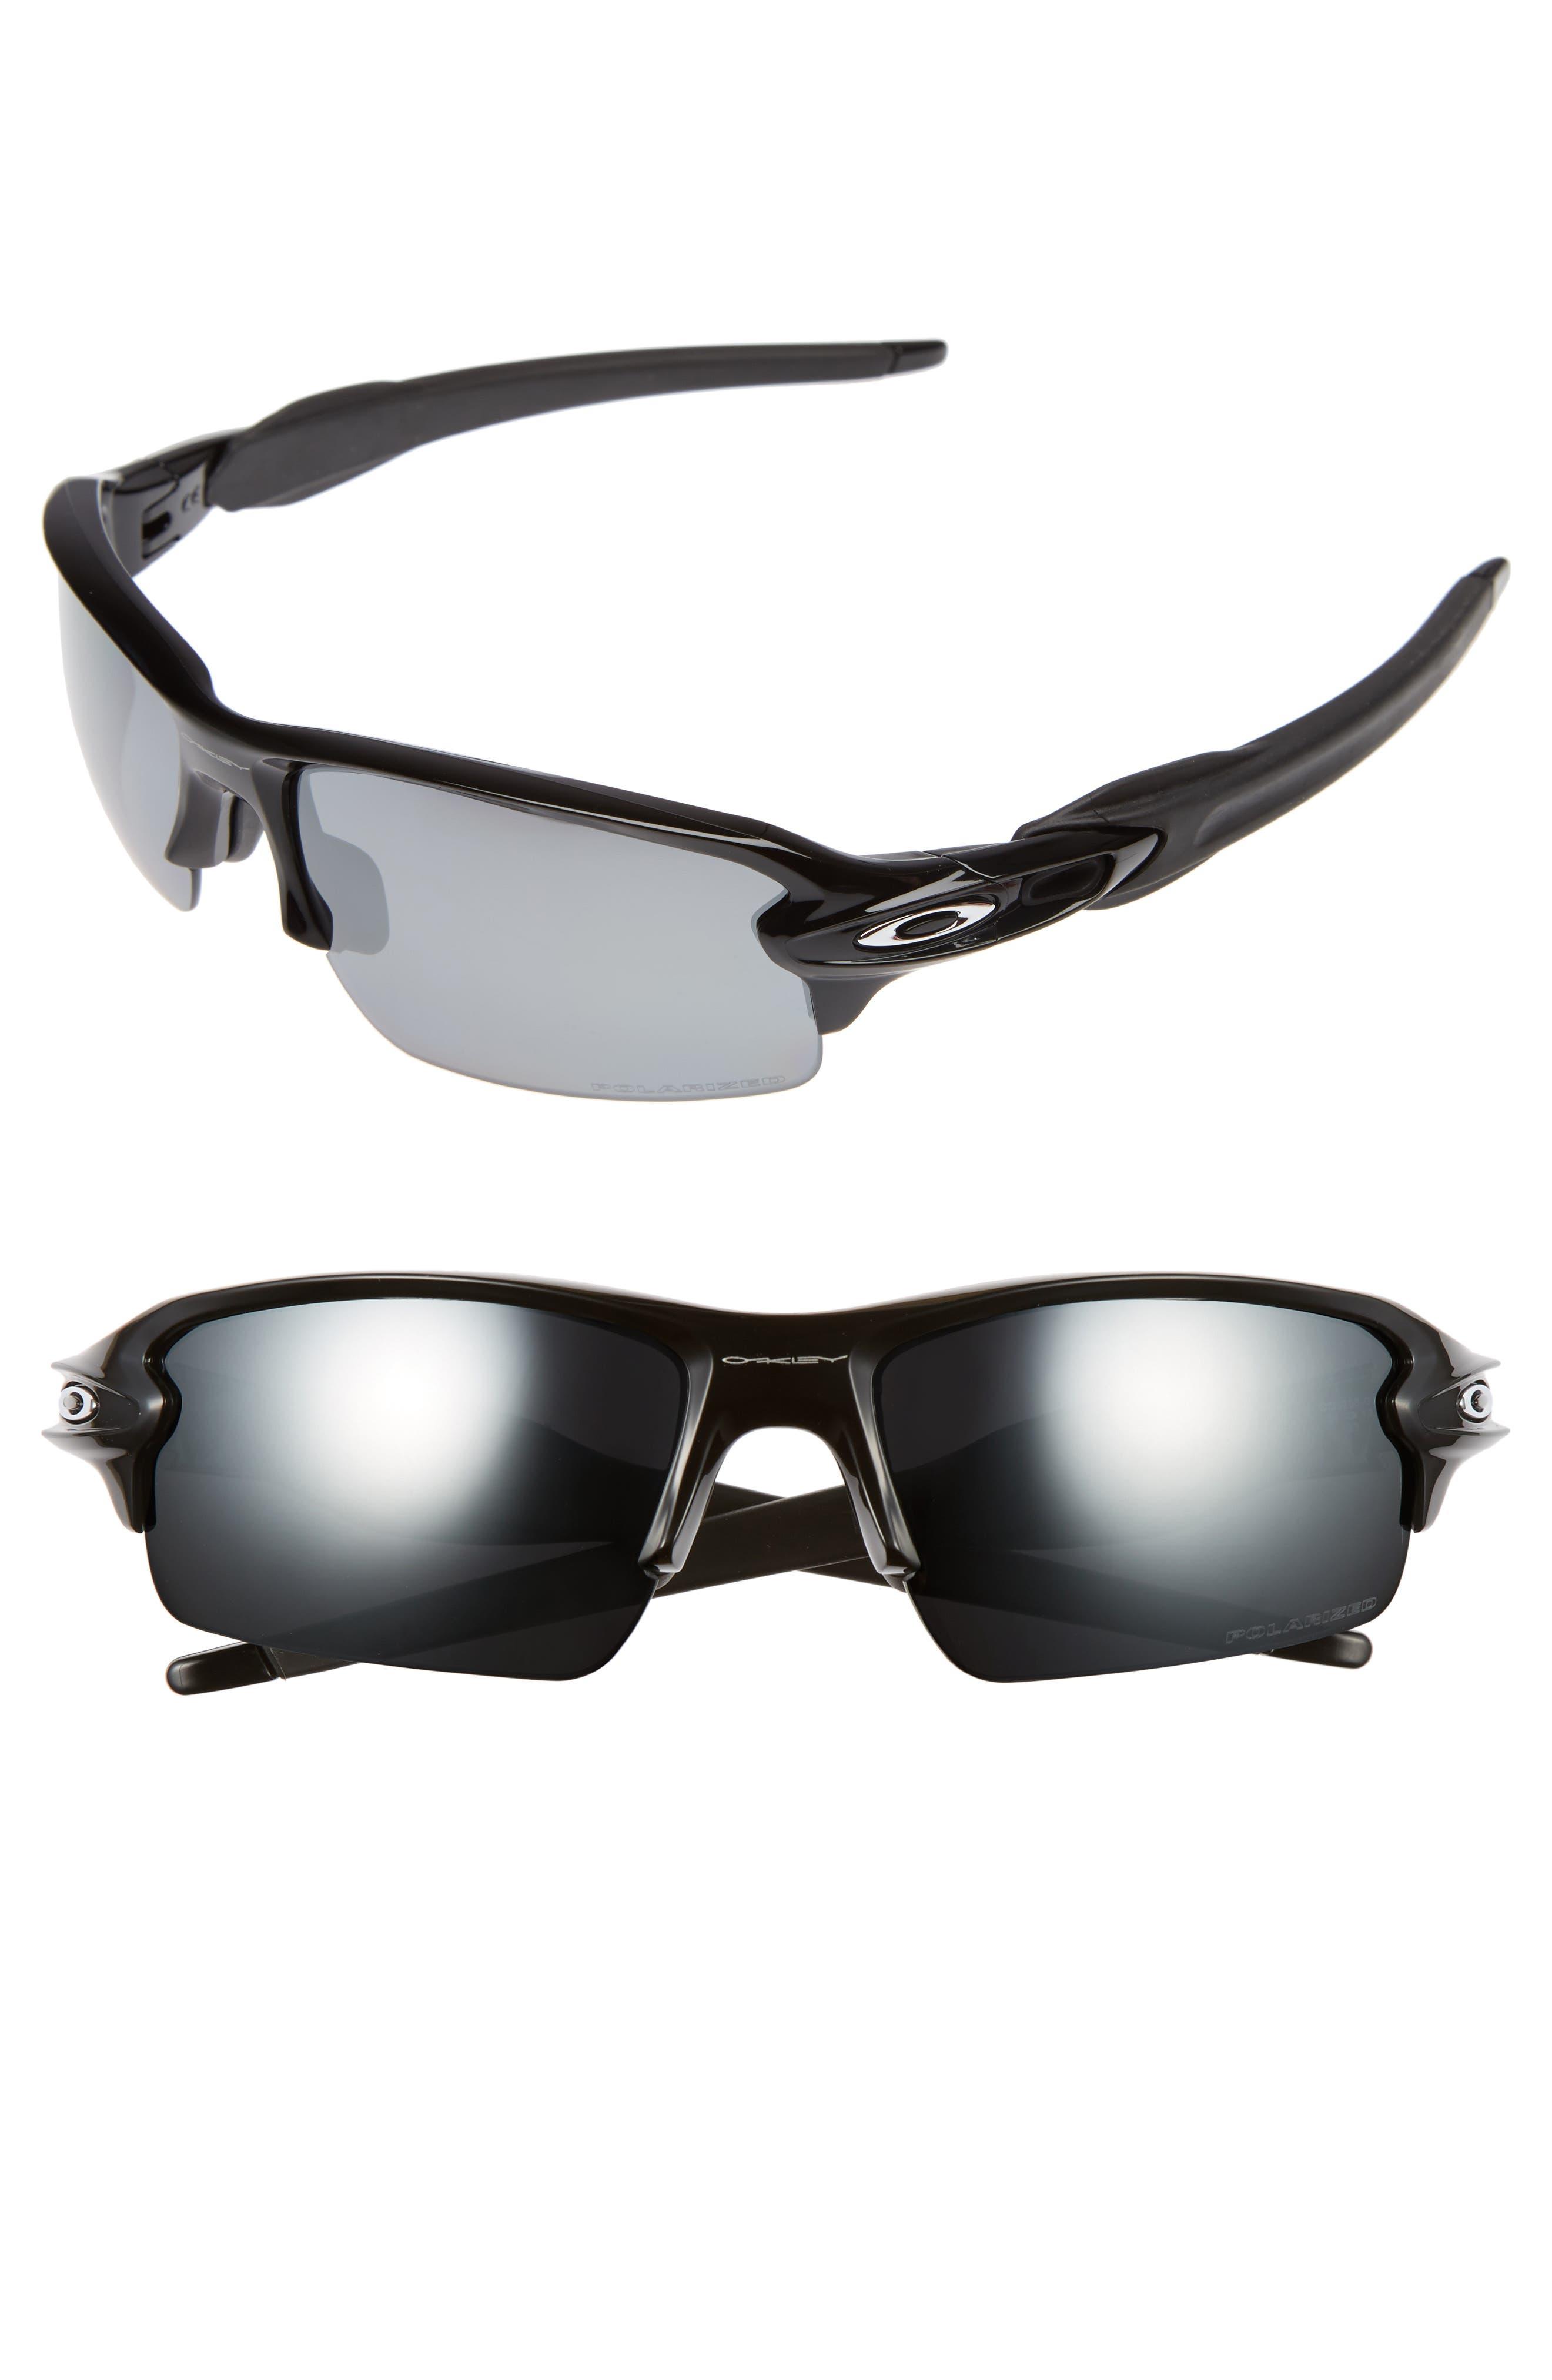 Flak 2.0 59mm Polarized Sunglasses,                         Main,                         color, Black